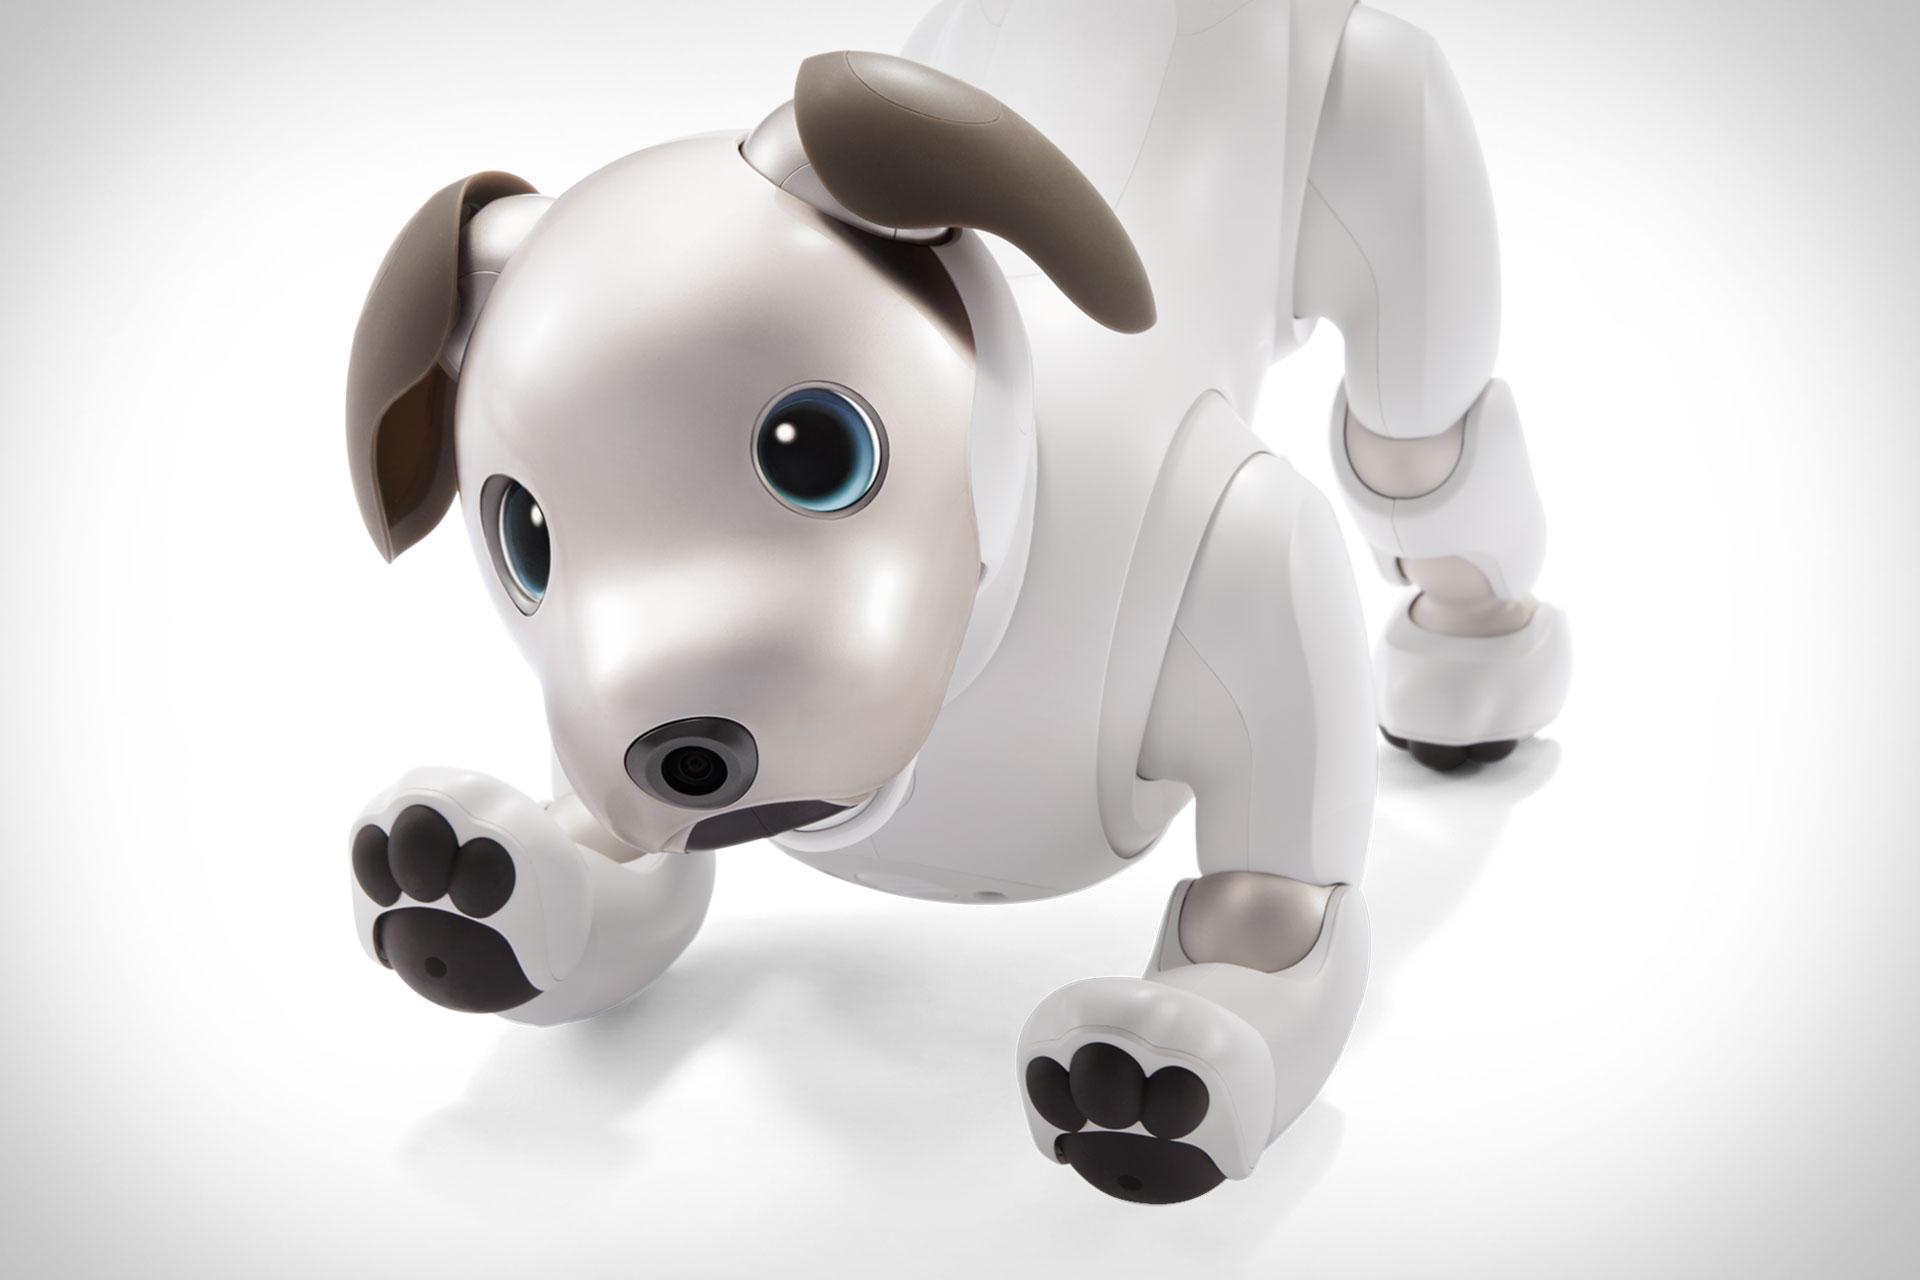 Sony Aibo Entertainment Robot